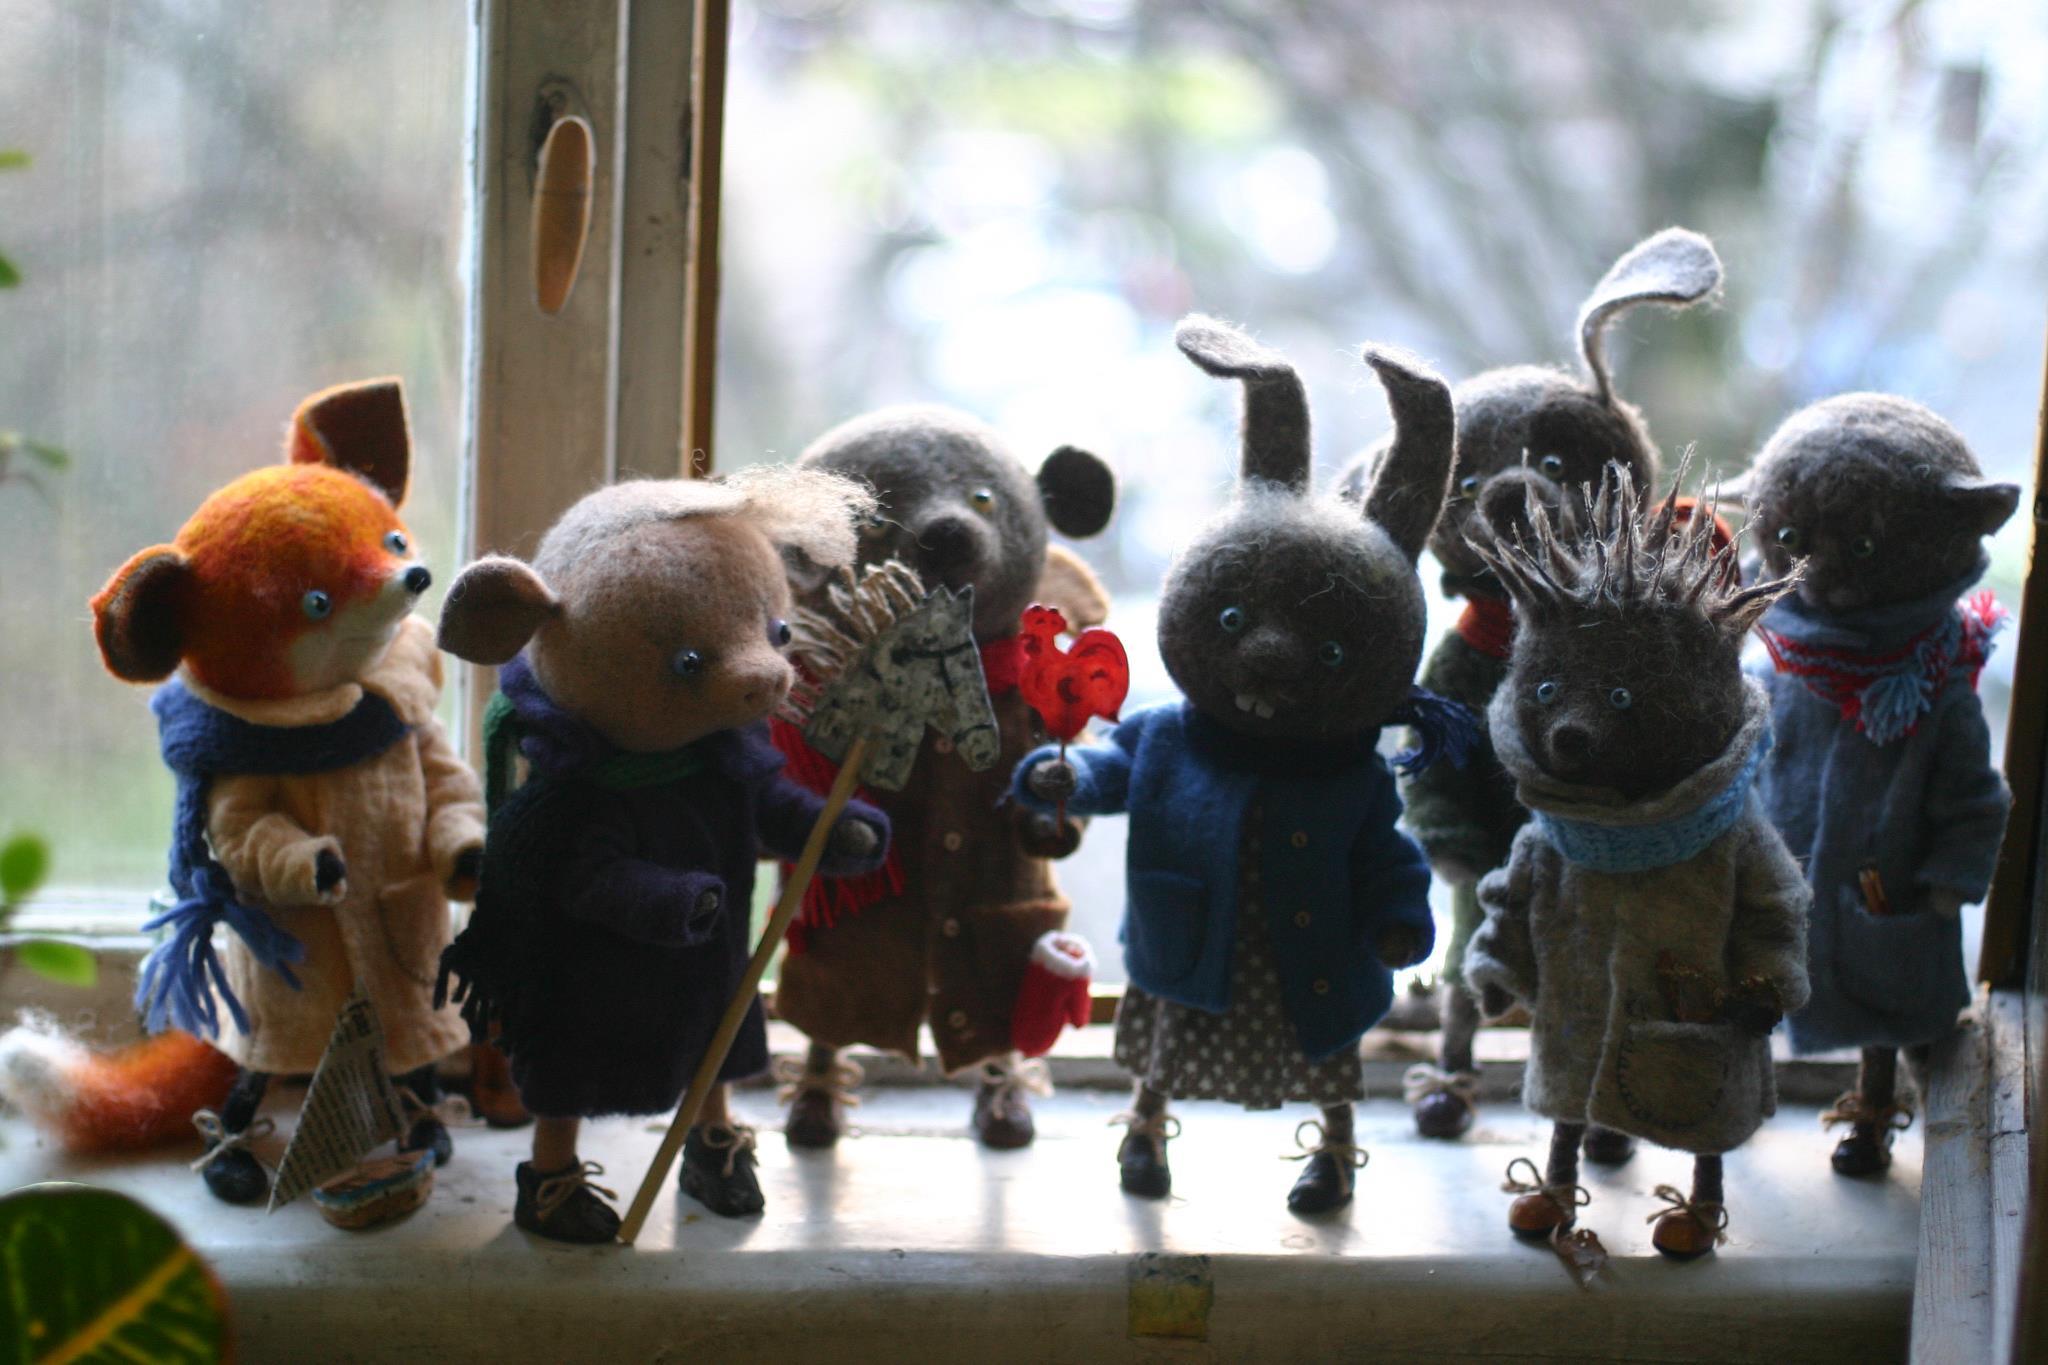 cutest-felt-kids-toys-ever-by-katerina-kozubenko-31.jpg